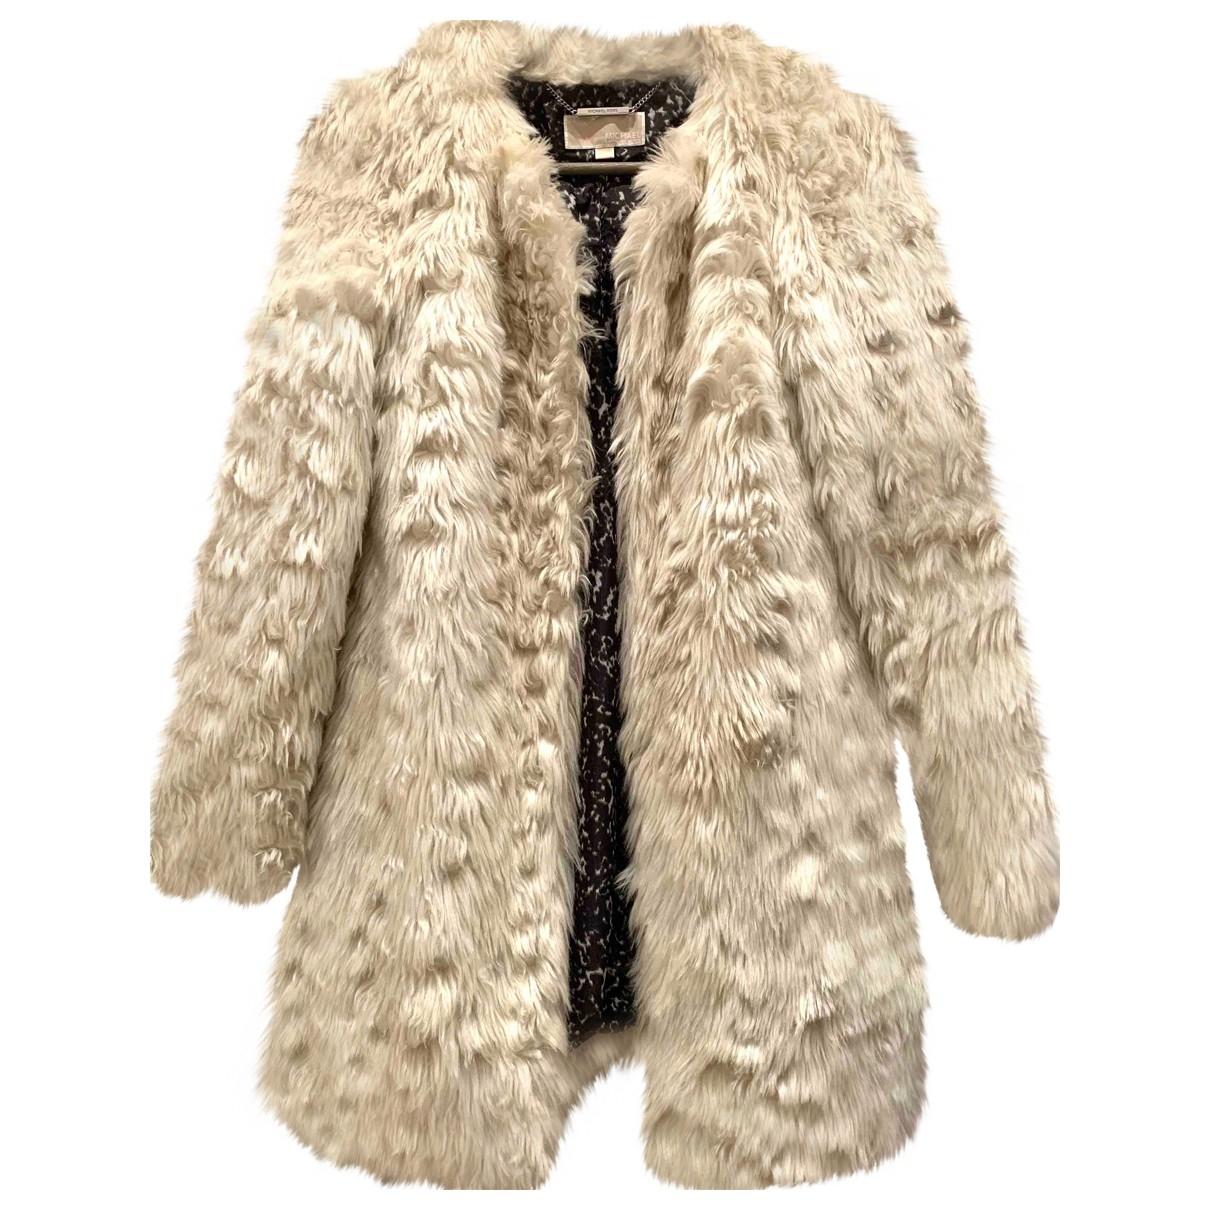 Michael Kors \N Ecru Faux fur coat for Women S International